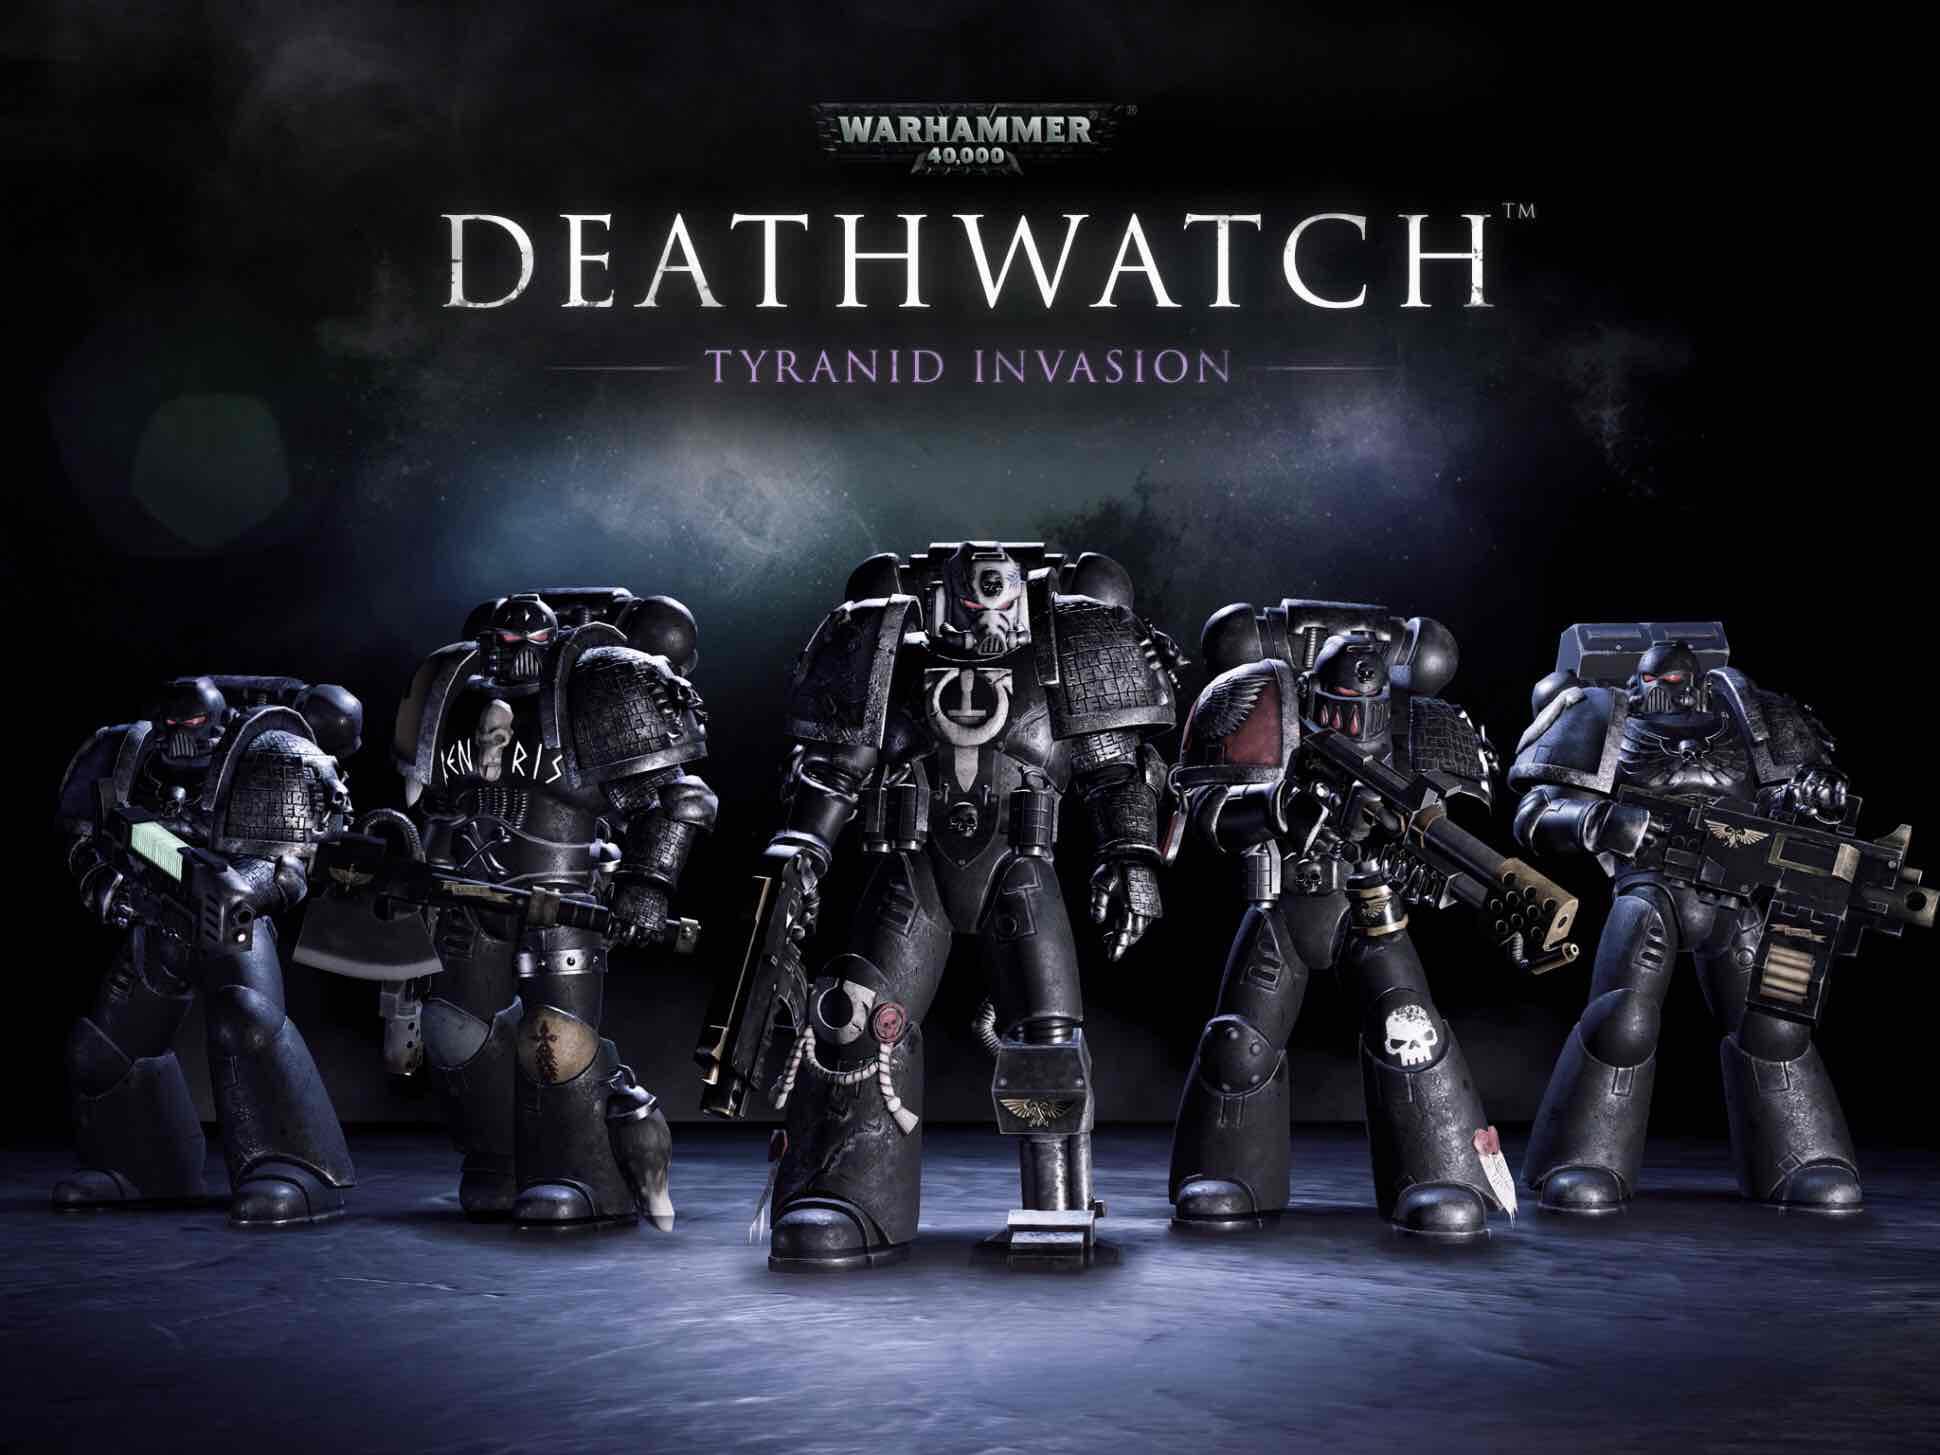 (iOS) Warhammer 40,000: Deathwatch - Tyranid Invasion za darmo - free app of the week